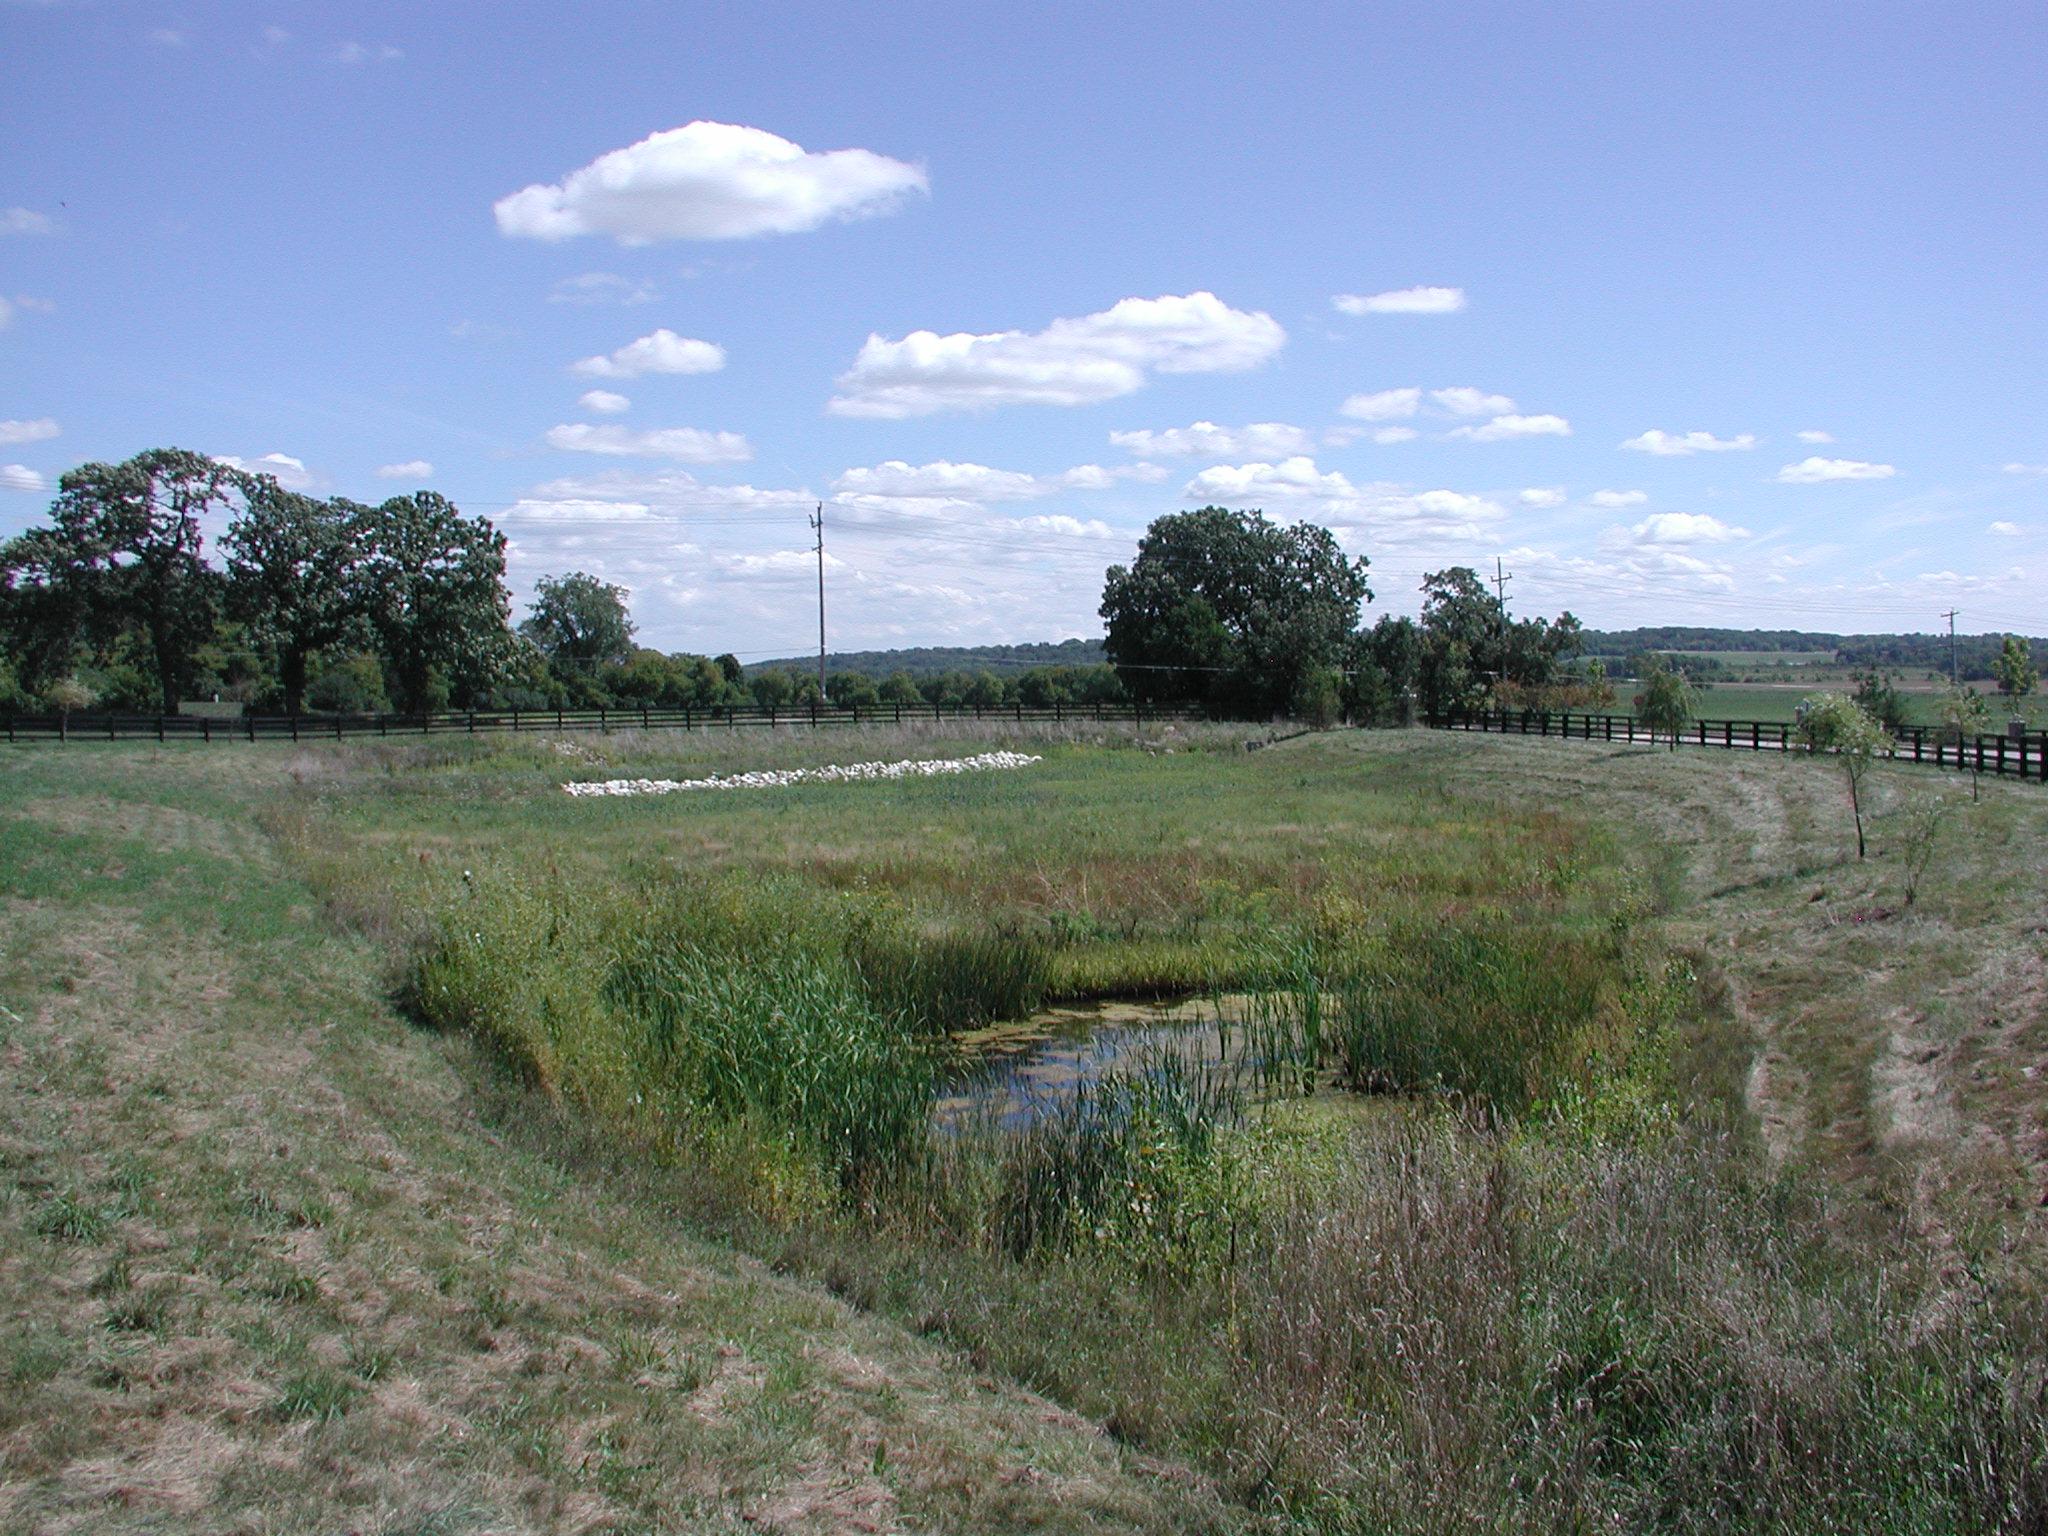 Stormwater Management Basin : Photos storm water runoff wisconsin dnr